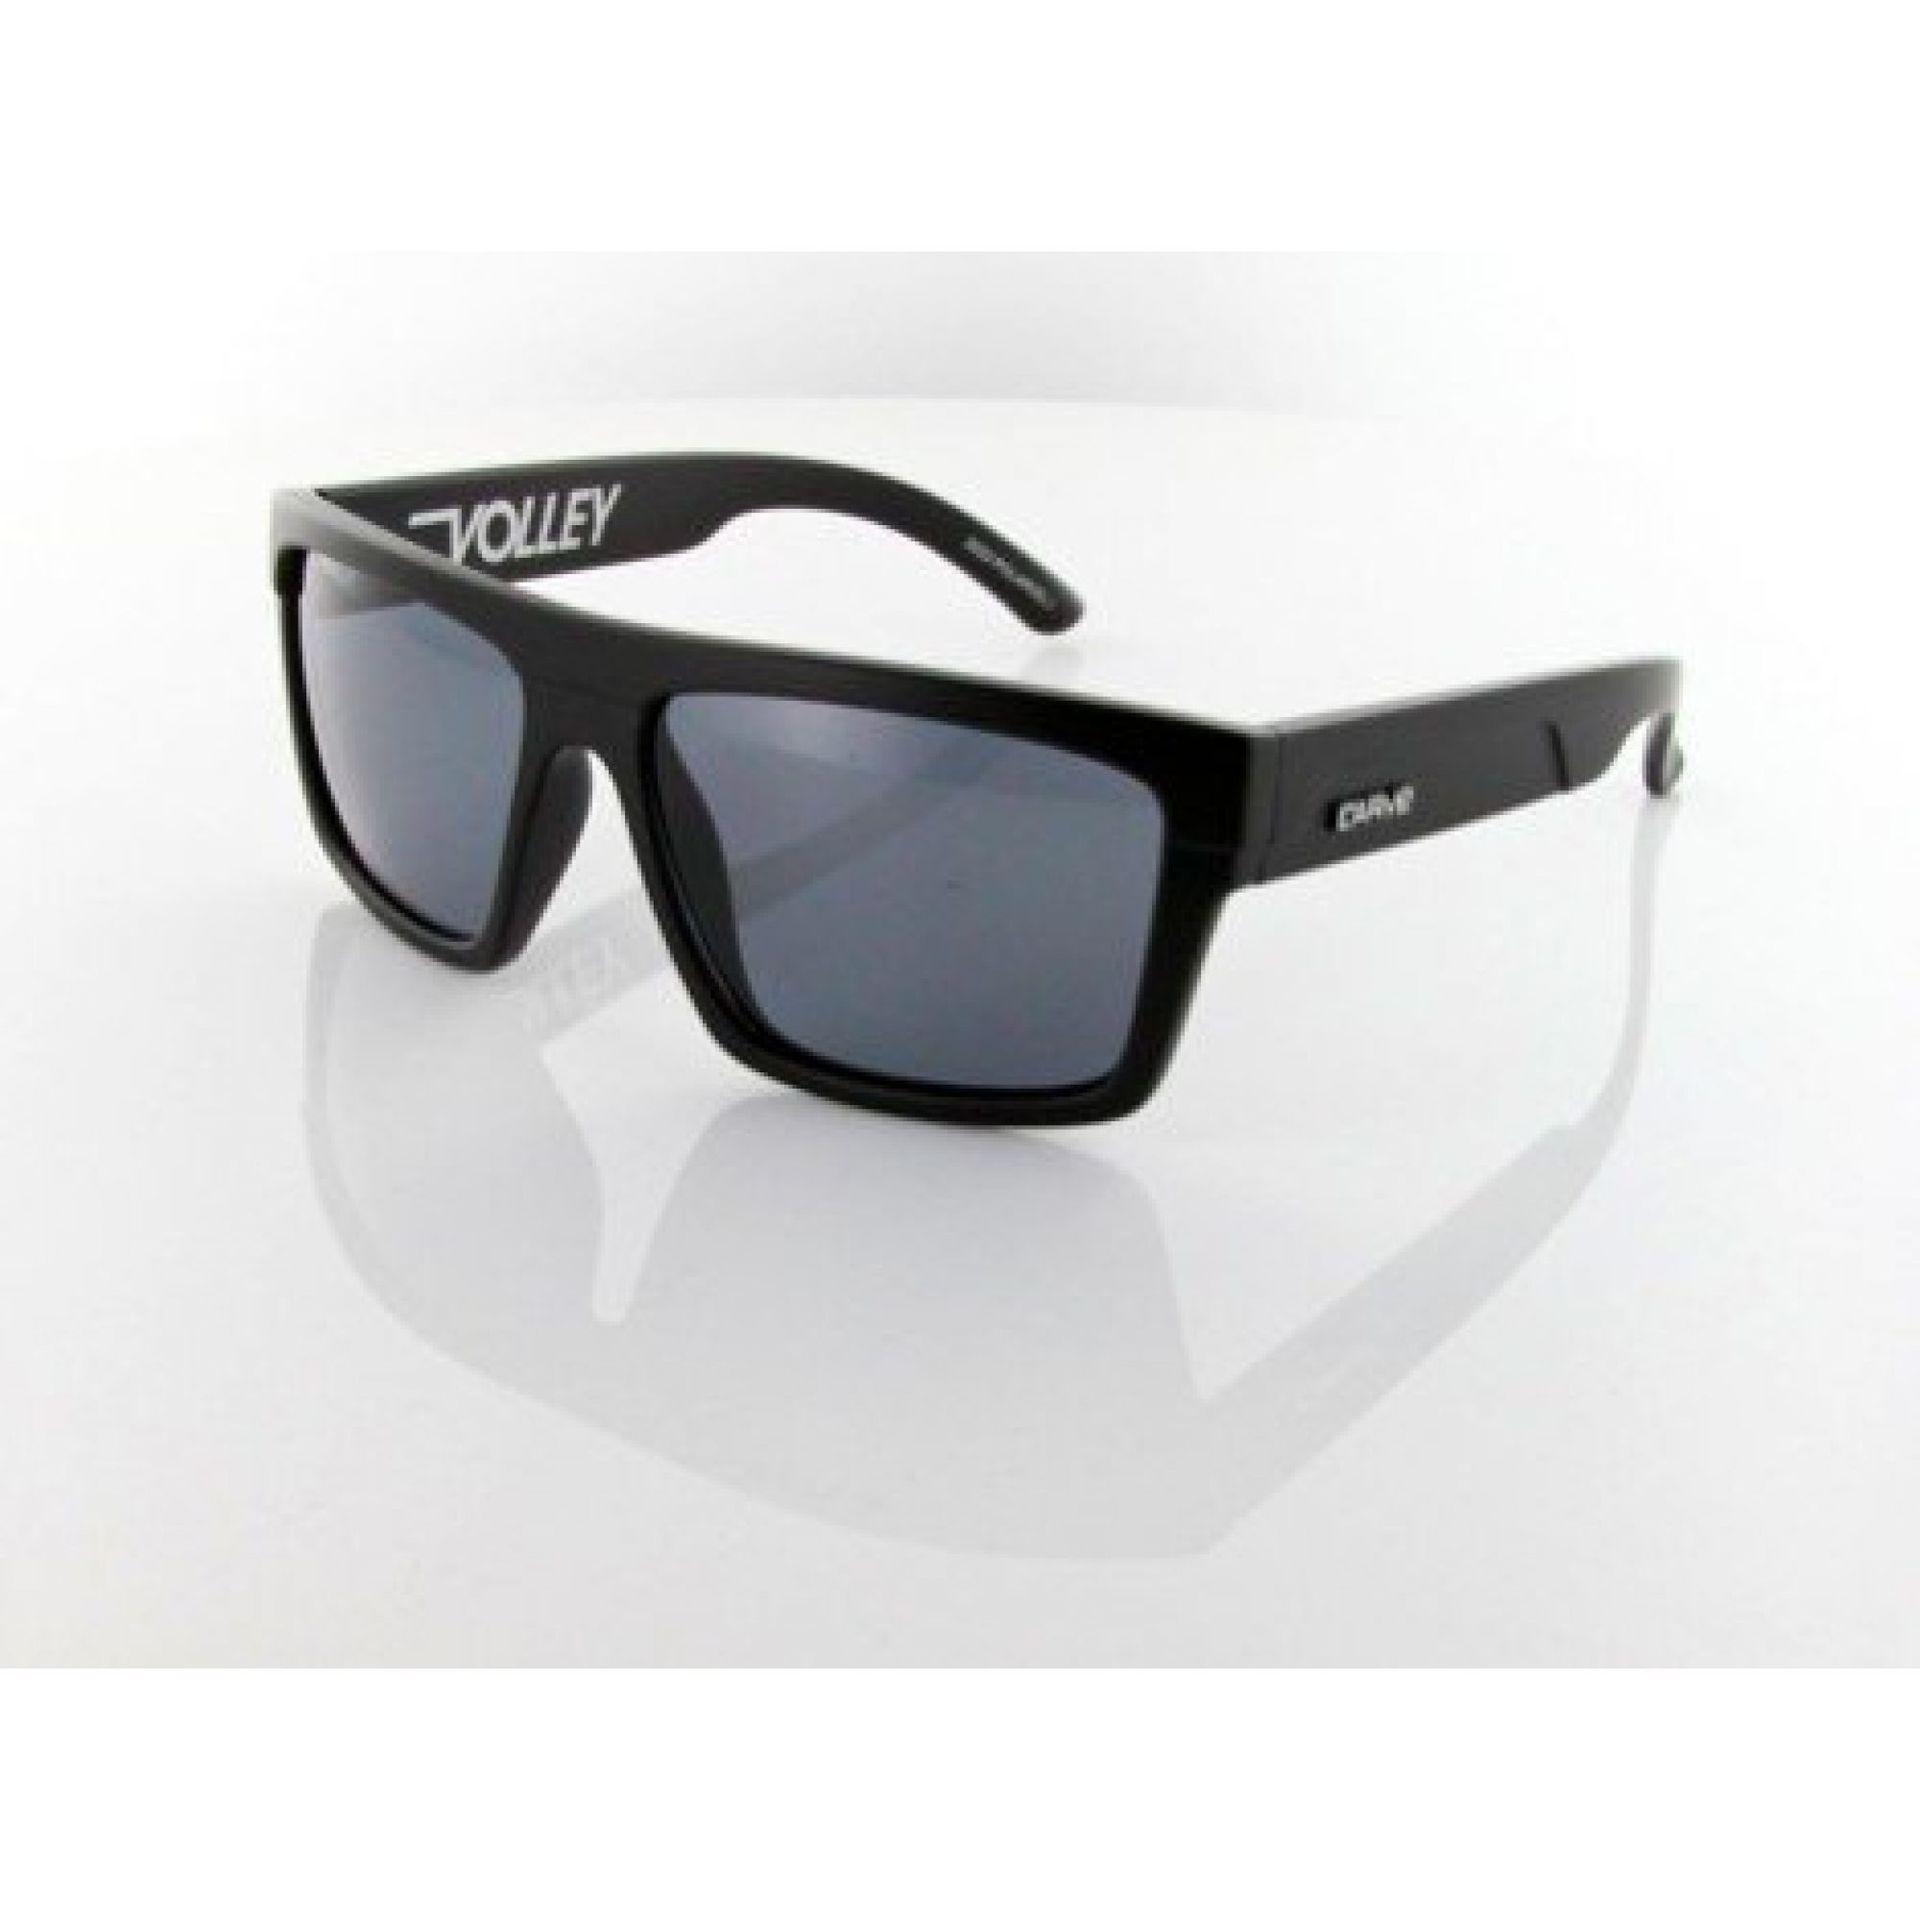 Okulary Carve Volley czarne